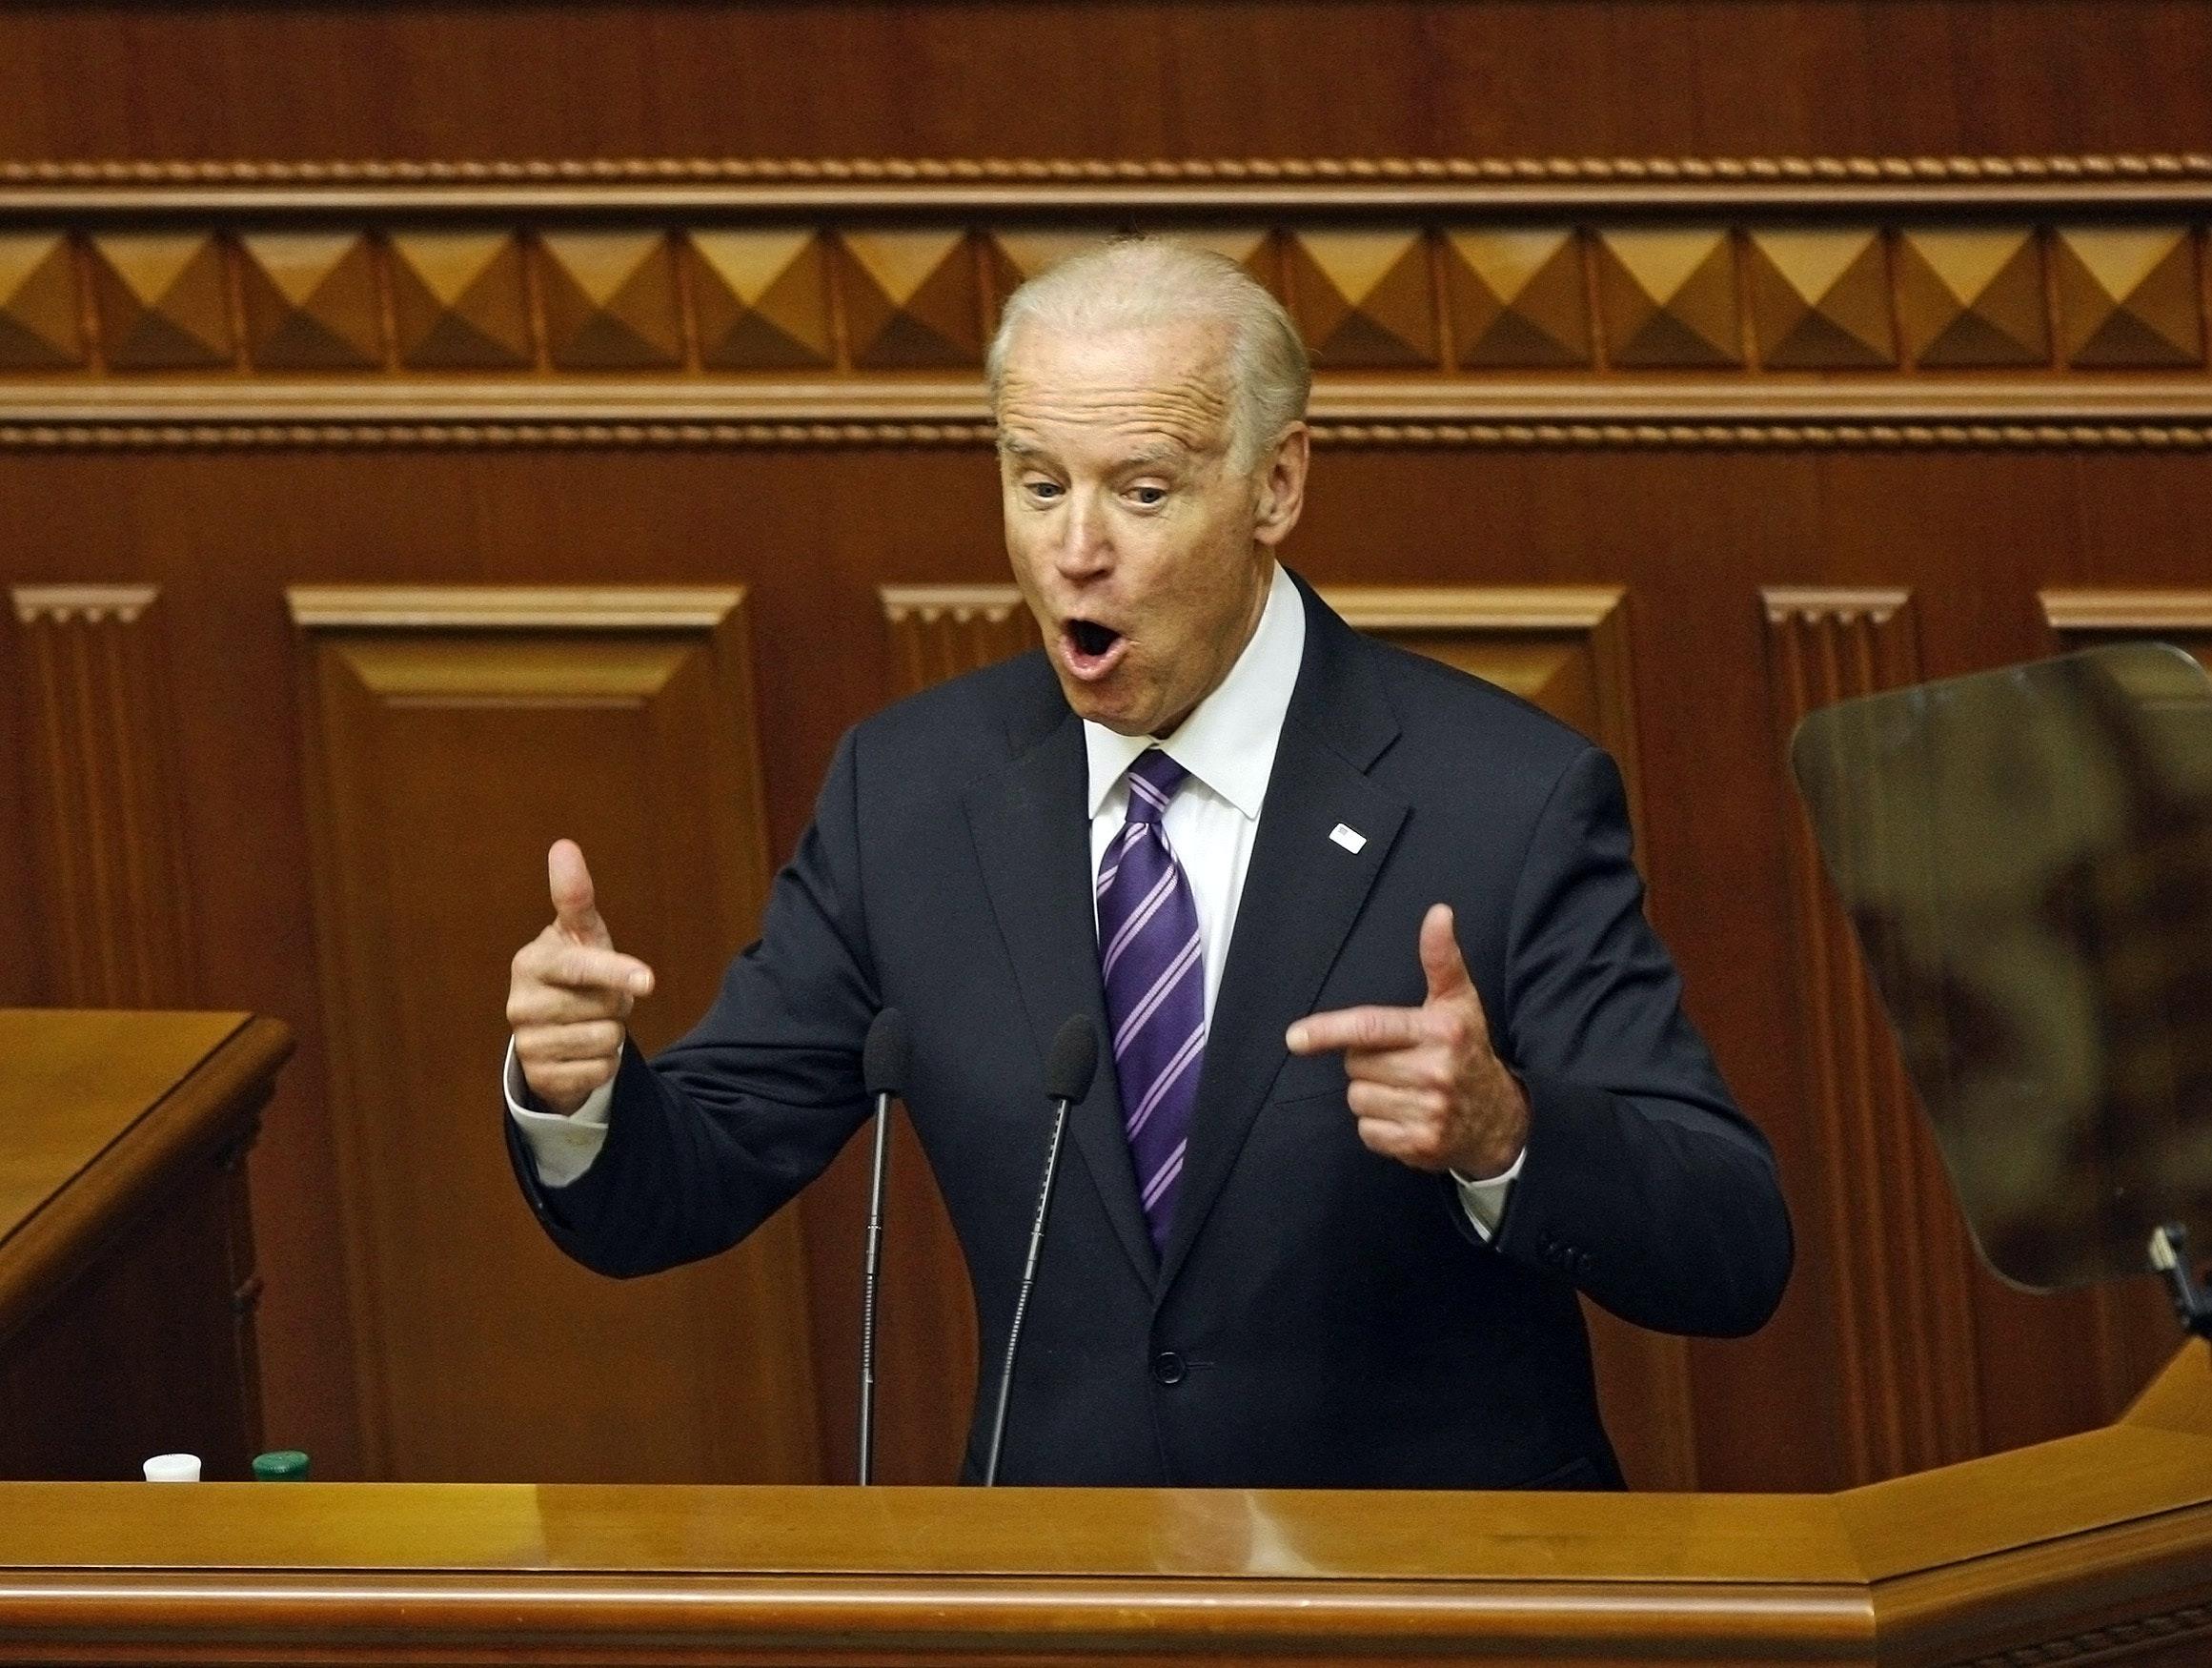 Please... god... anyone but Joe Biden